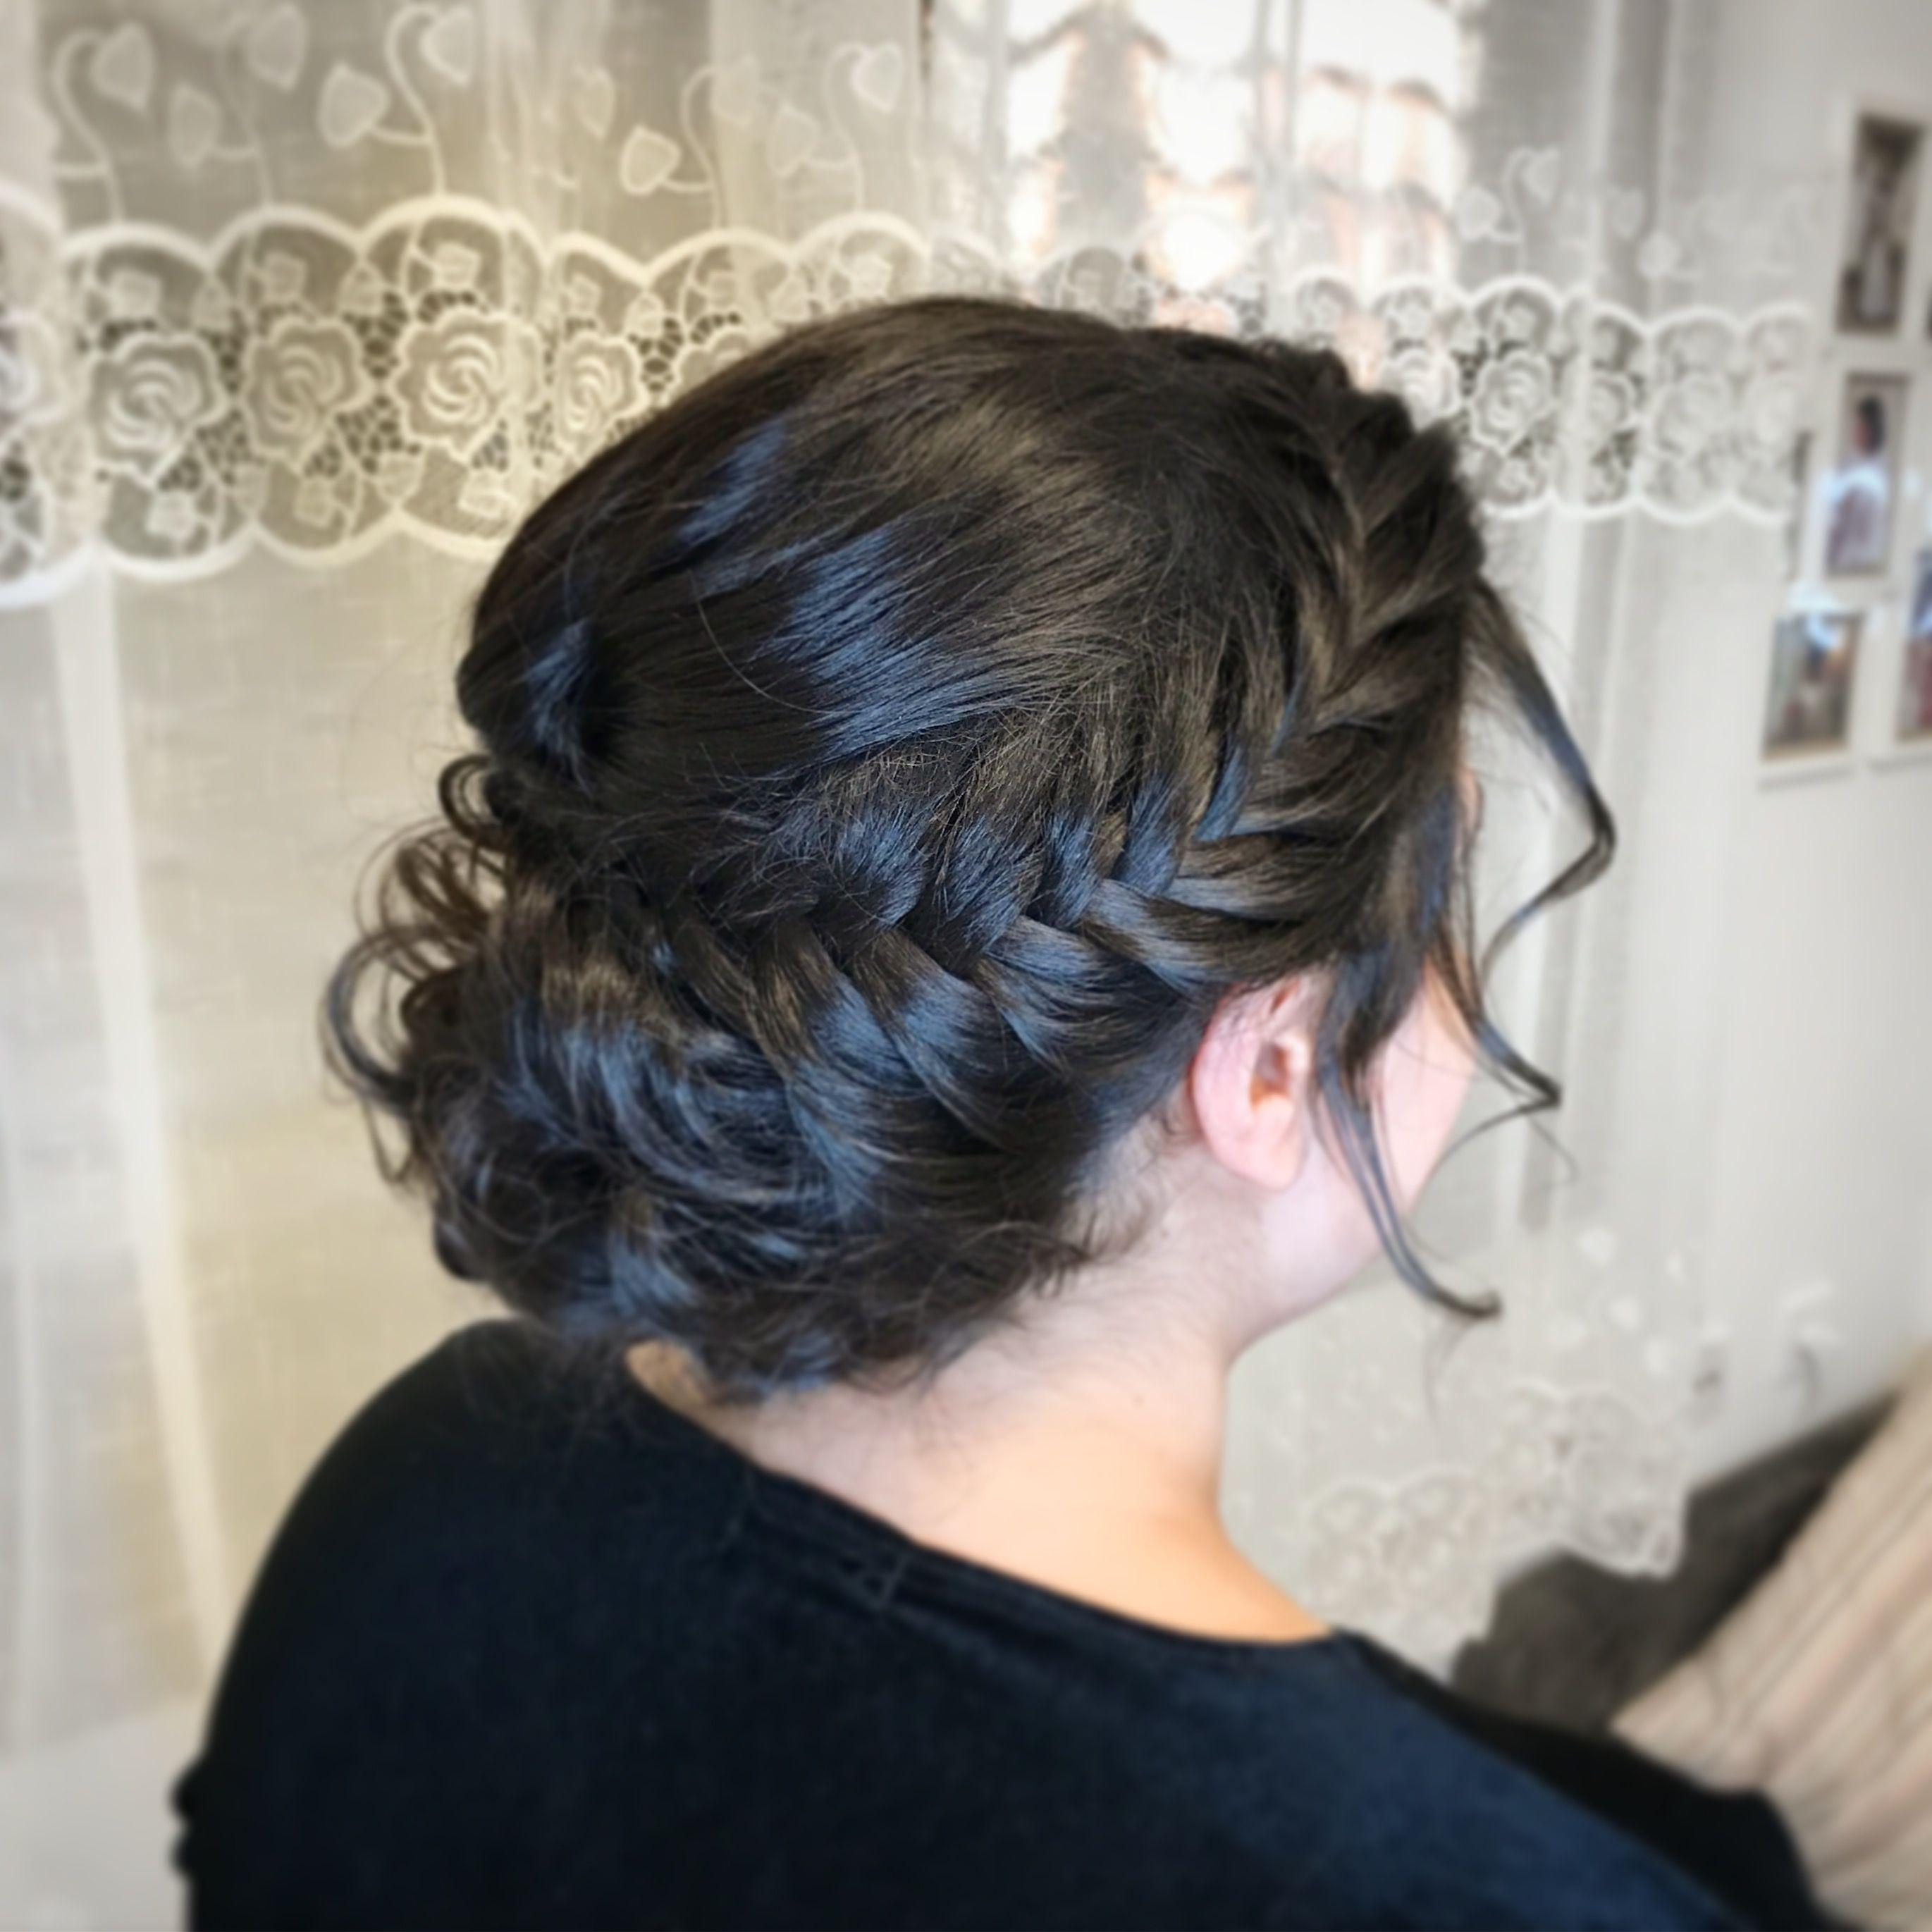 adi hair - #yafitkoresh #bridehairstyle #weddingday